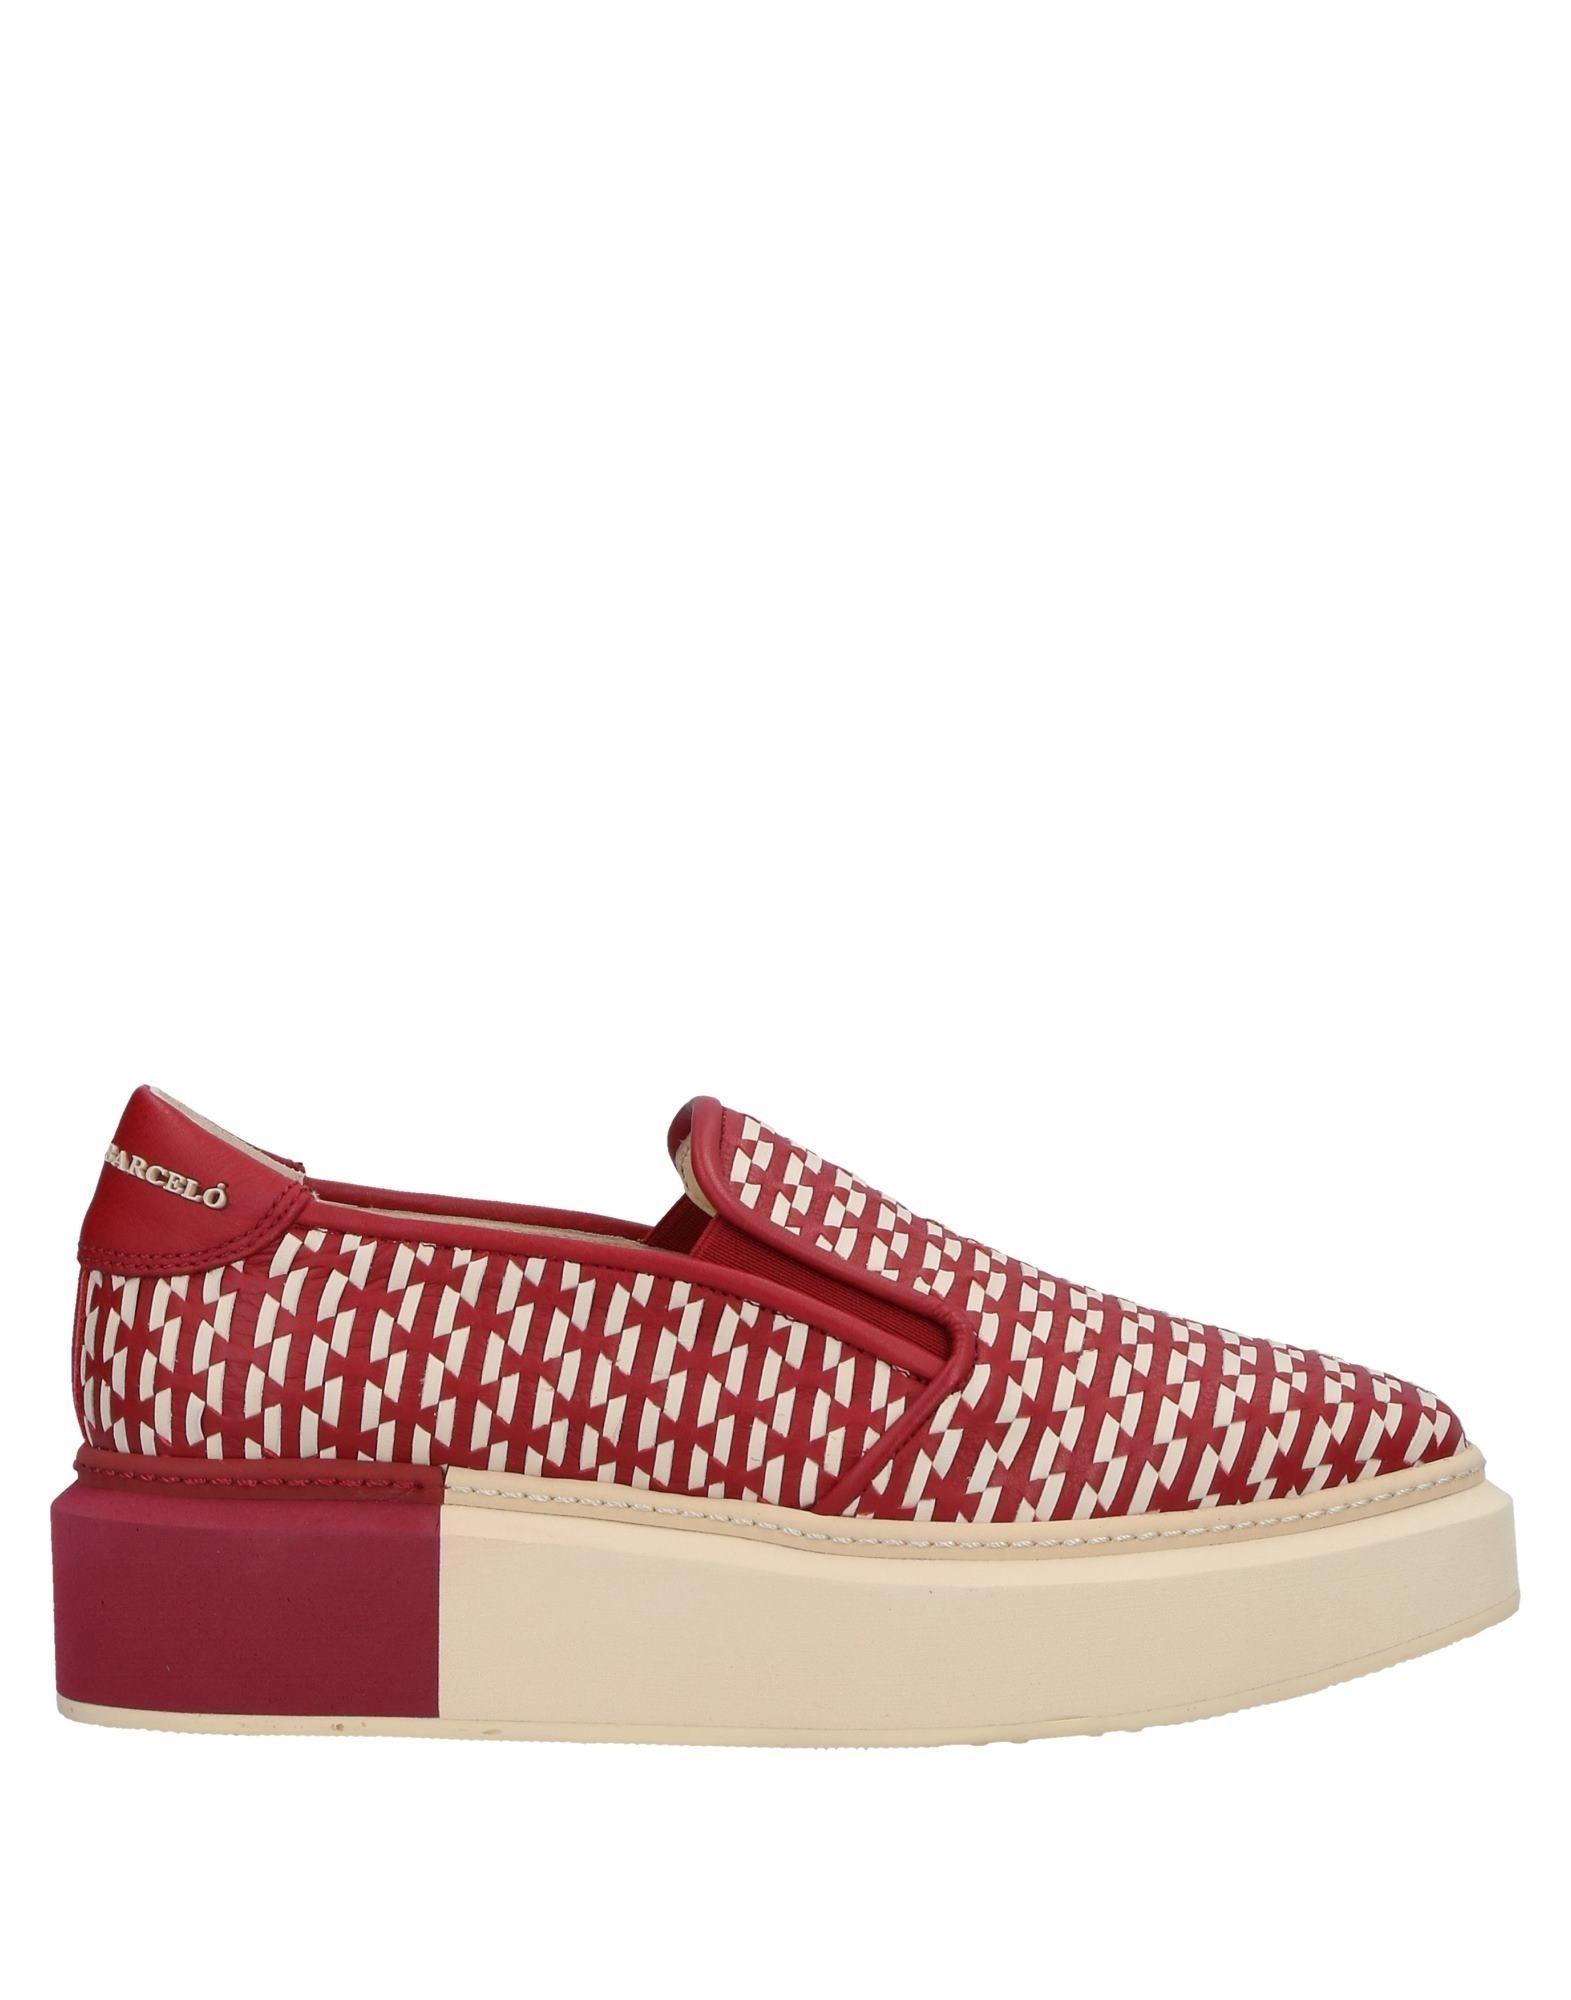 Stilvolle billige Schuhe Manuel Barceló Sneakers Damen  11534771UA